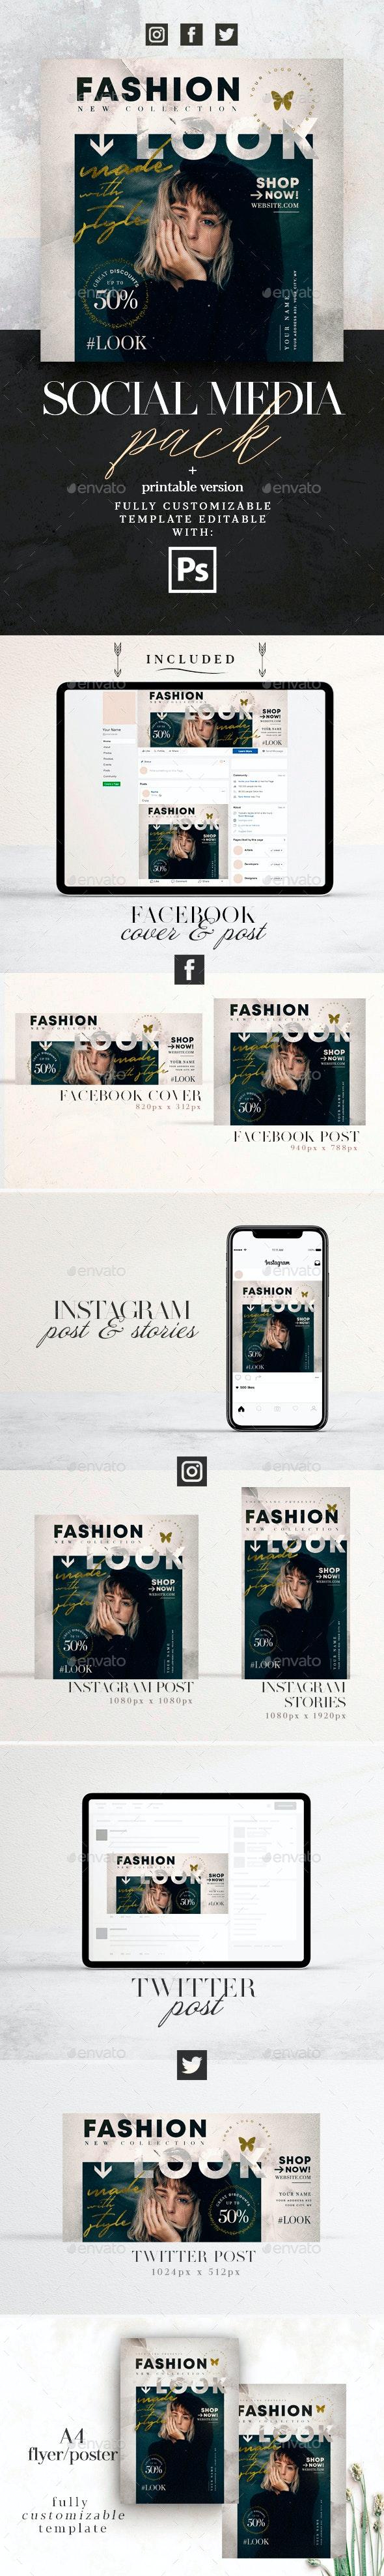 Fashion Look Social Media Pack + Flyer Template - Social Media Web Elements